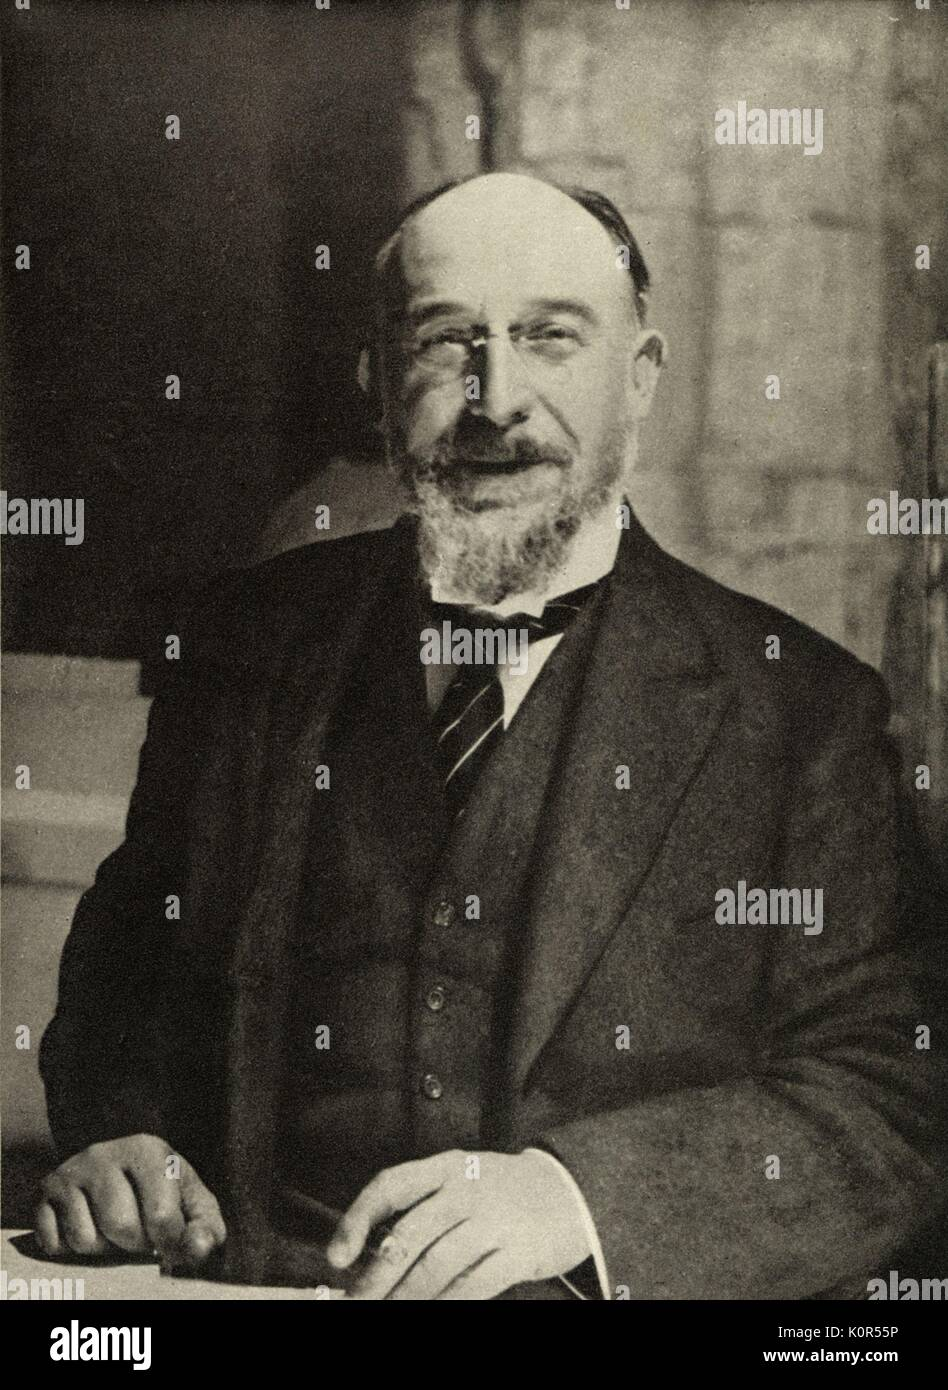 erik satie Erik satie was born on may 17, 1866 in honfleur, calvados, france as erik alfred leslie-satie he died on july 5, 1925 in arcueil, seine [now val-de-marne], france.